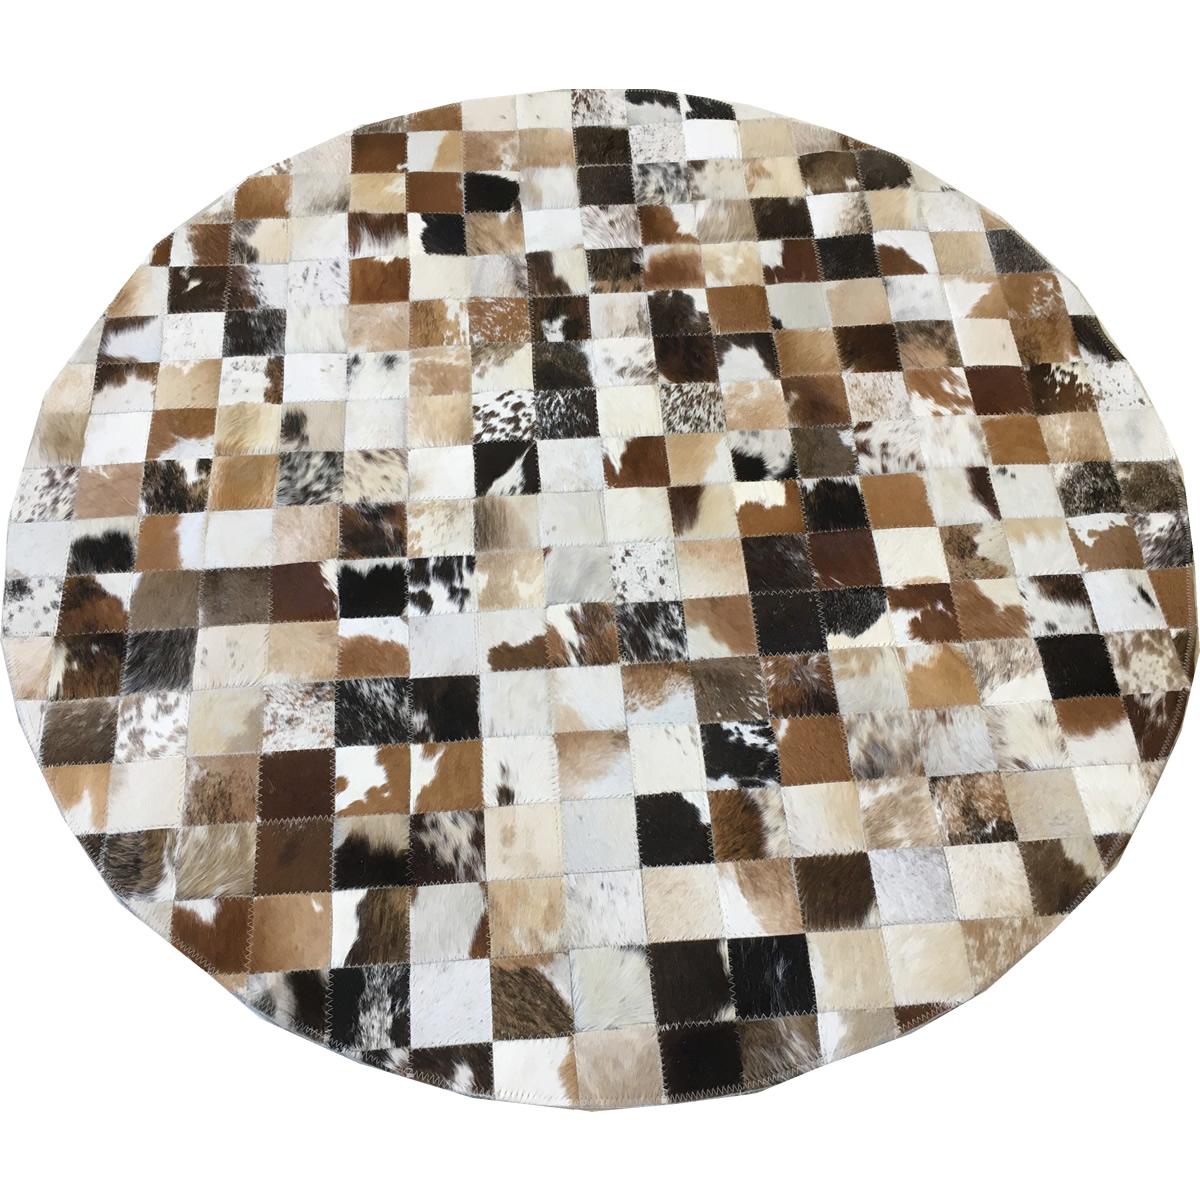 Tapete de couro marrom malhado 1,20 diâmetro sem bordas